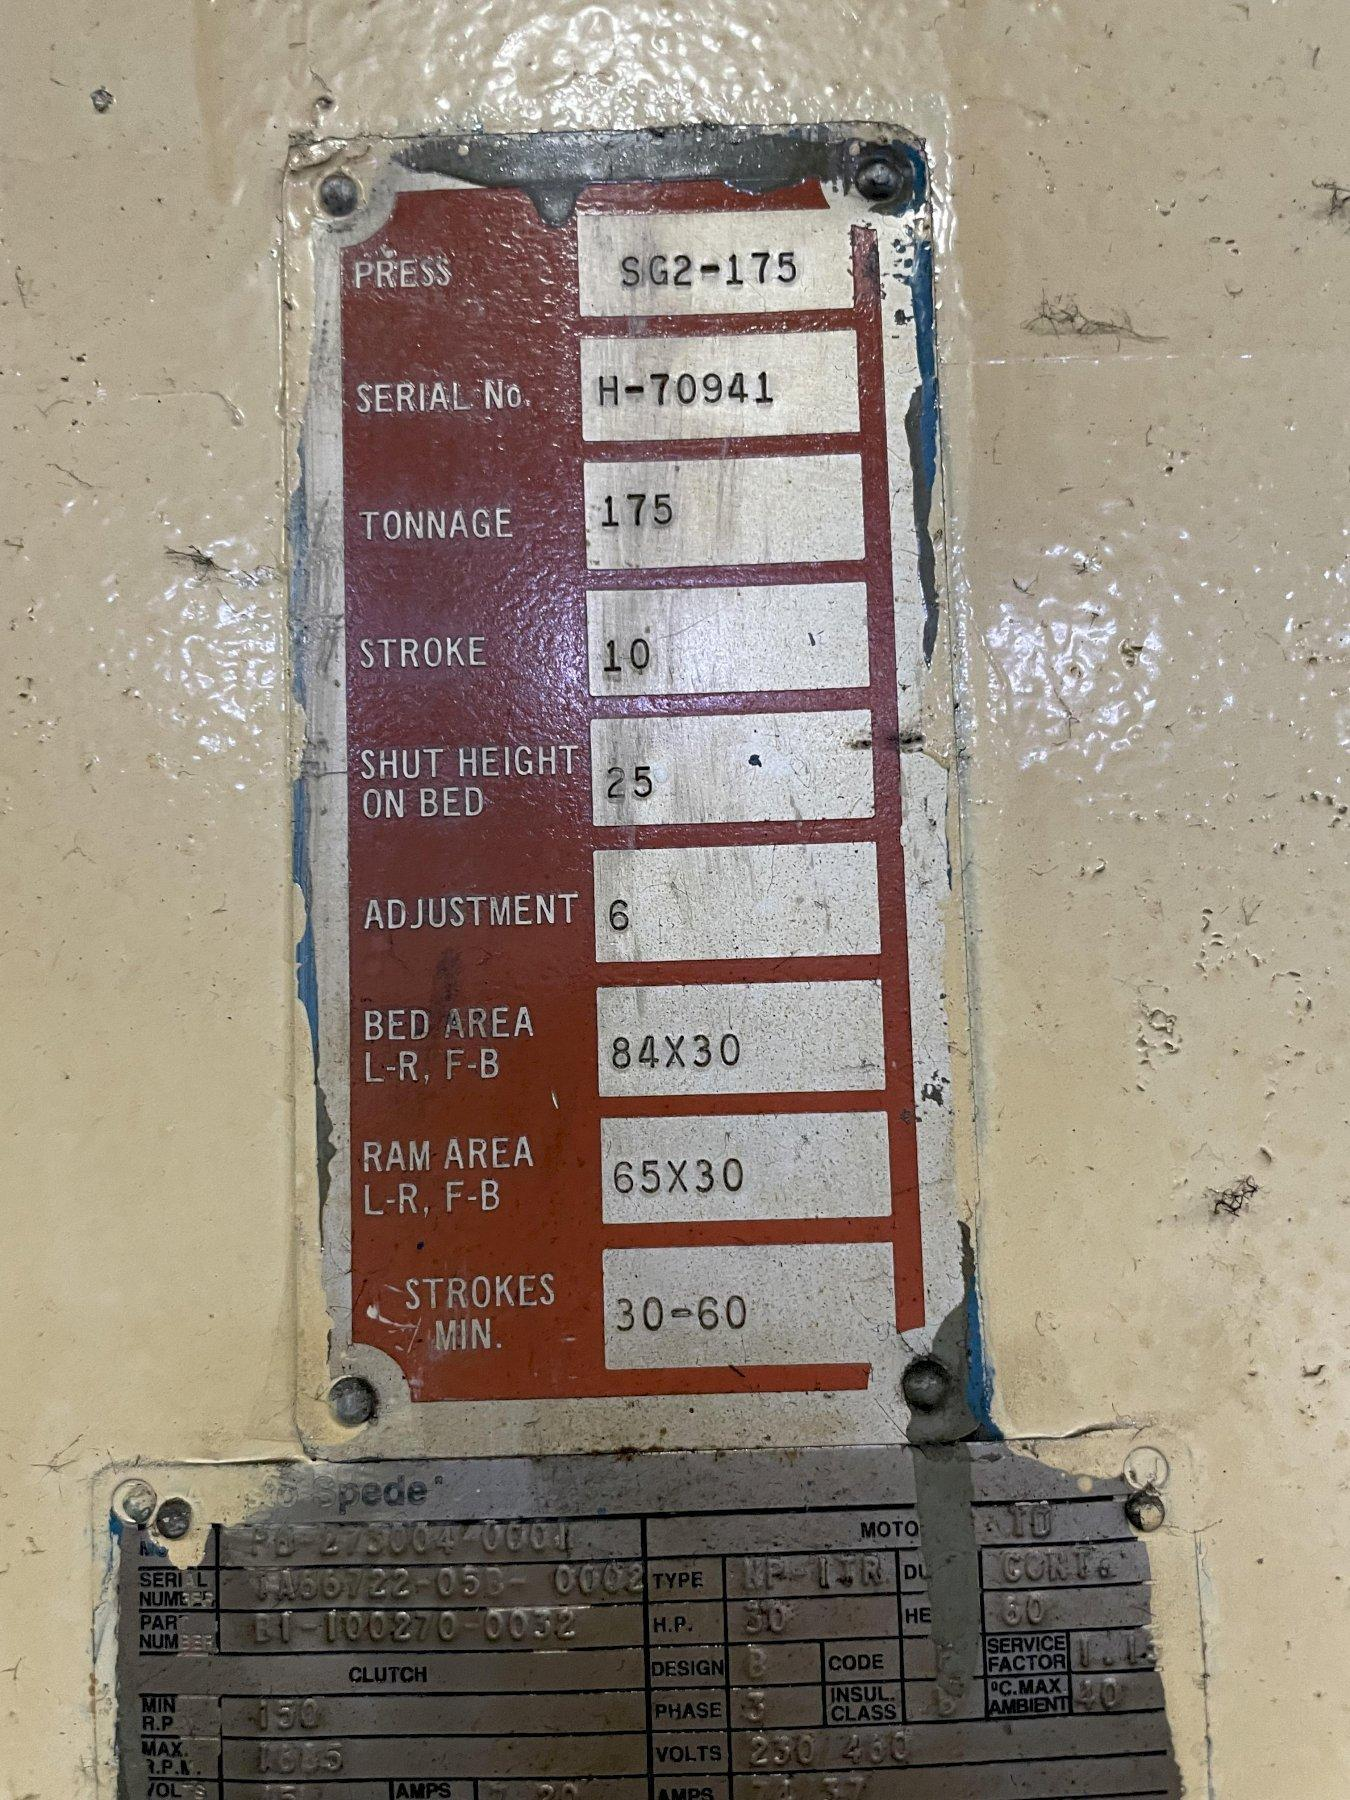 175 TON BLISS SG2-175 DOUBLE CRANK GAP FRAME PRESS. STOCK # 0635221